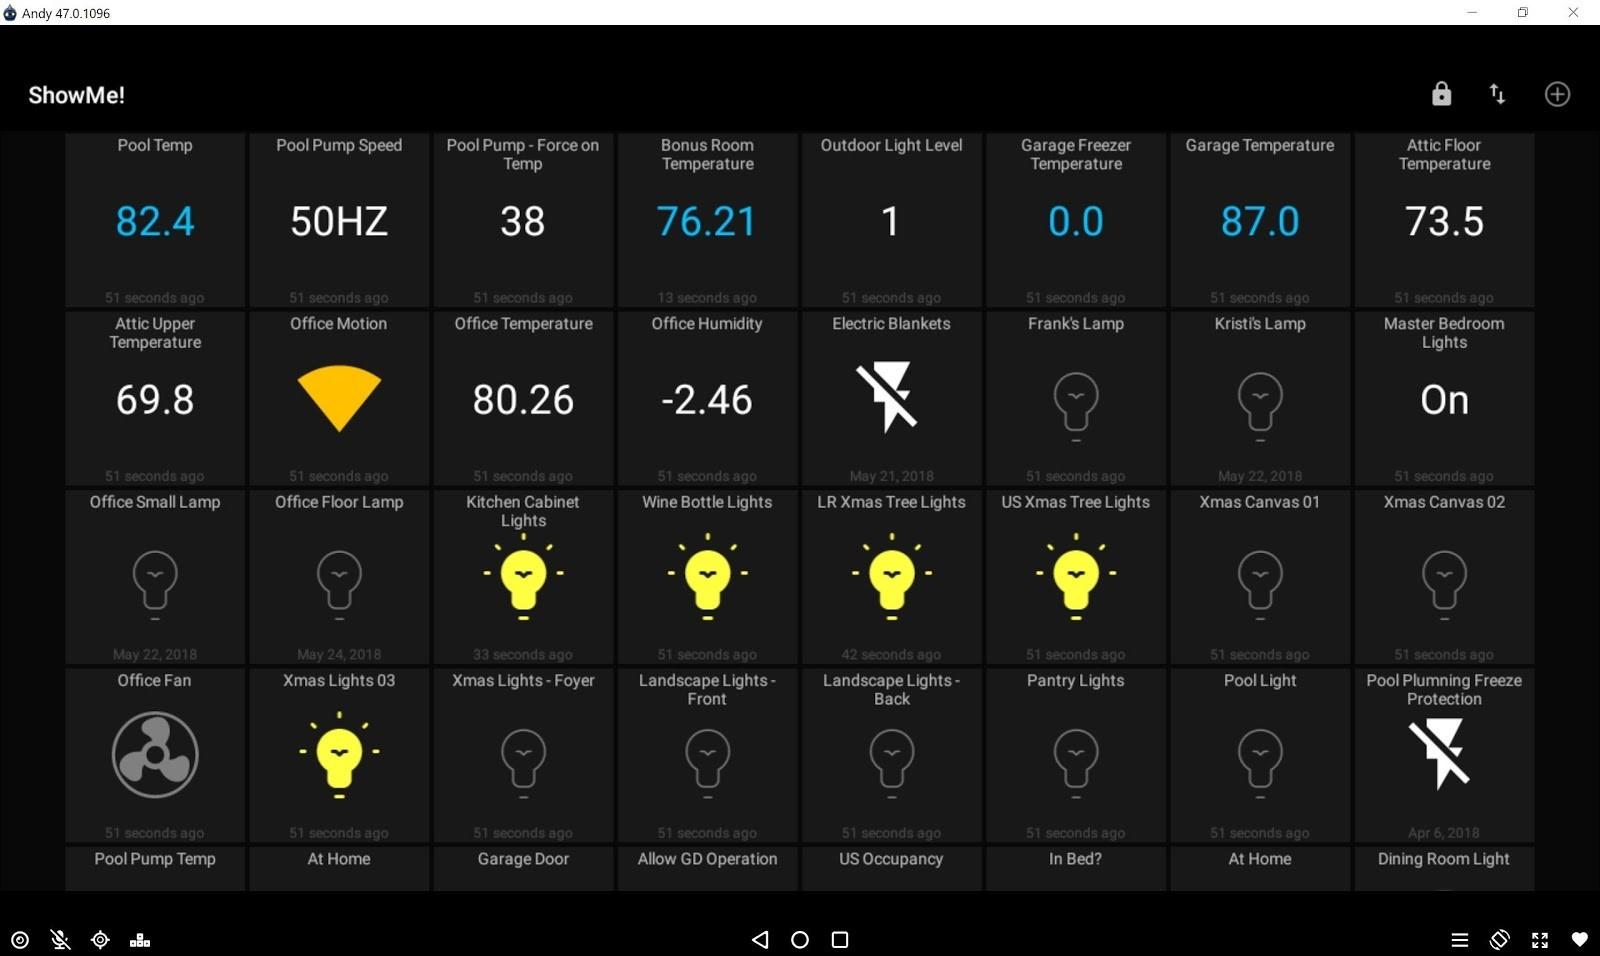 mqtt-dash-appliciation-android-emulator-on-pc-11